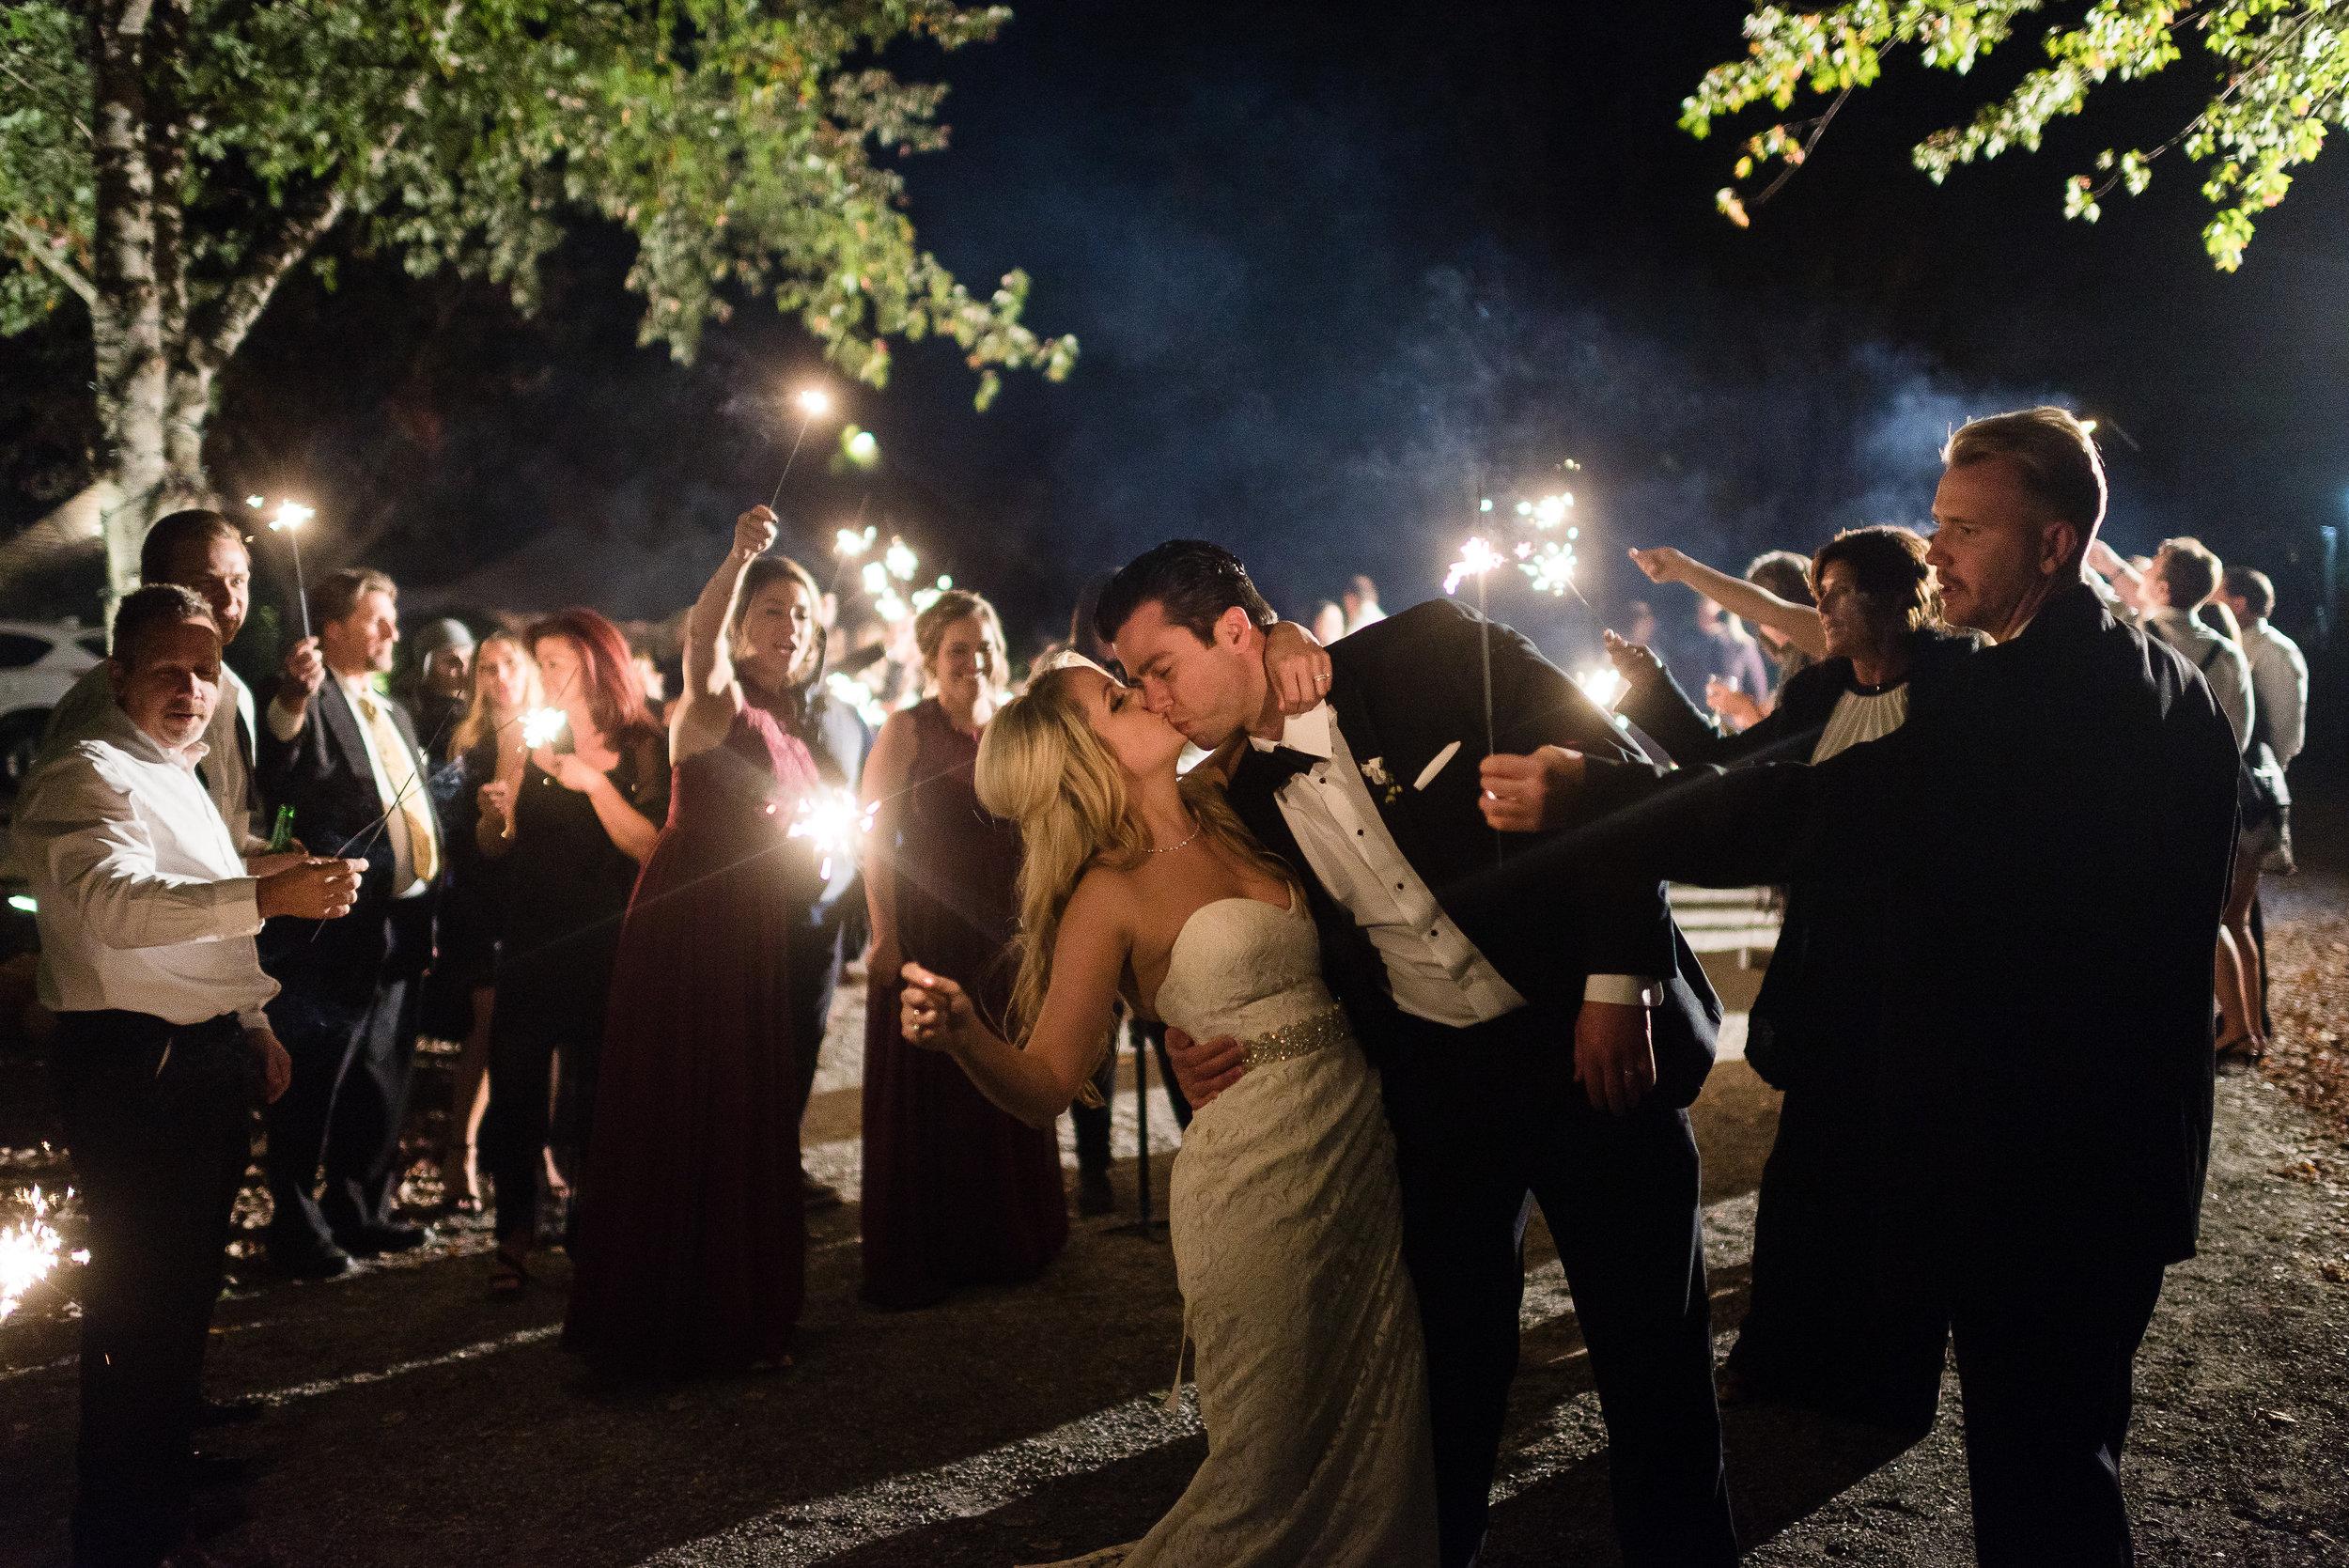 20161022_hawkesdene_fall_wedding_photos_2245.jpg